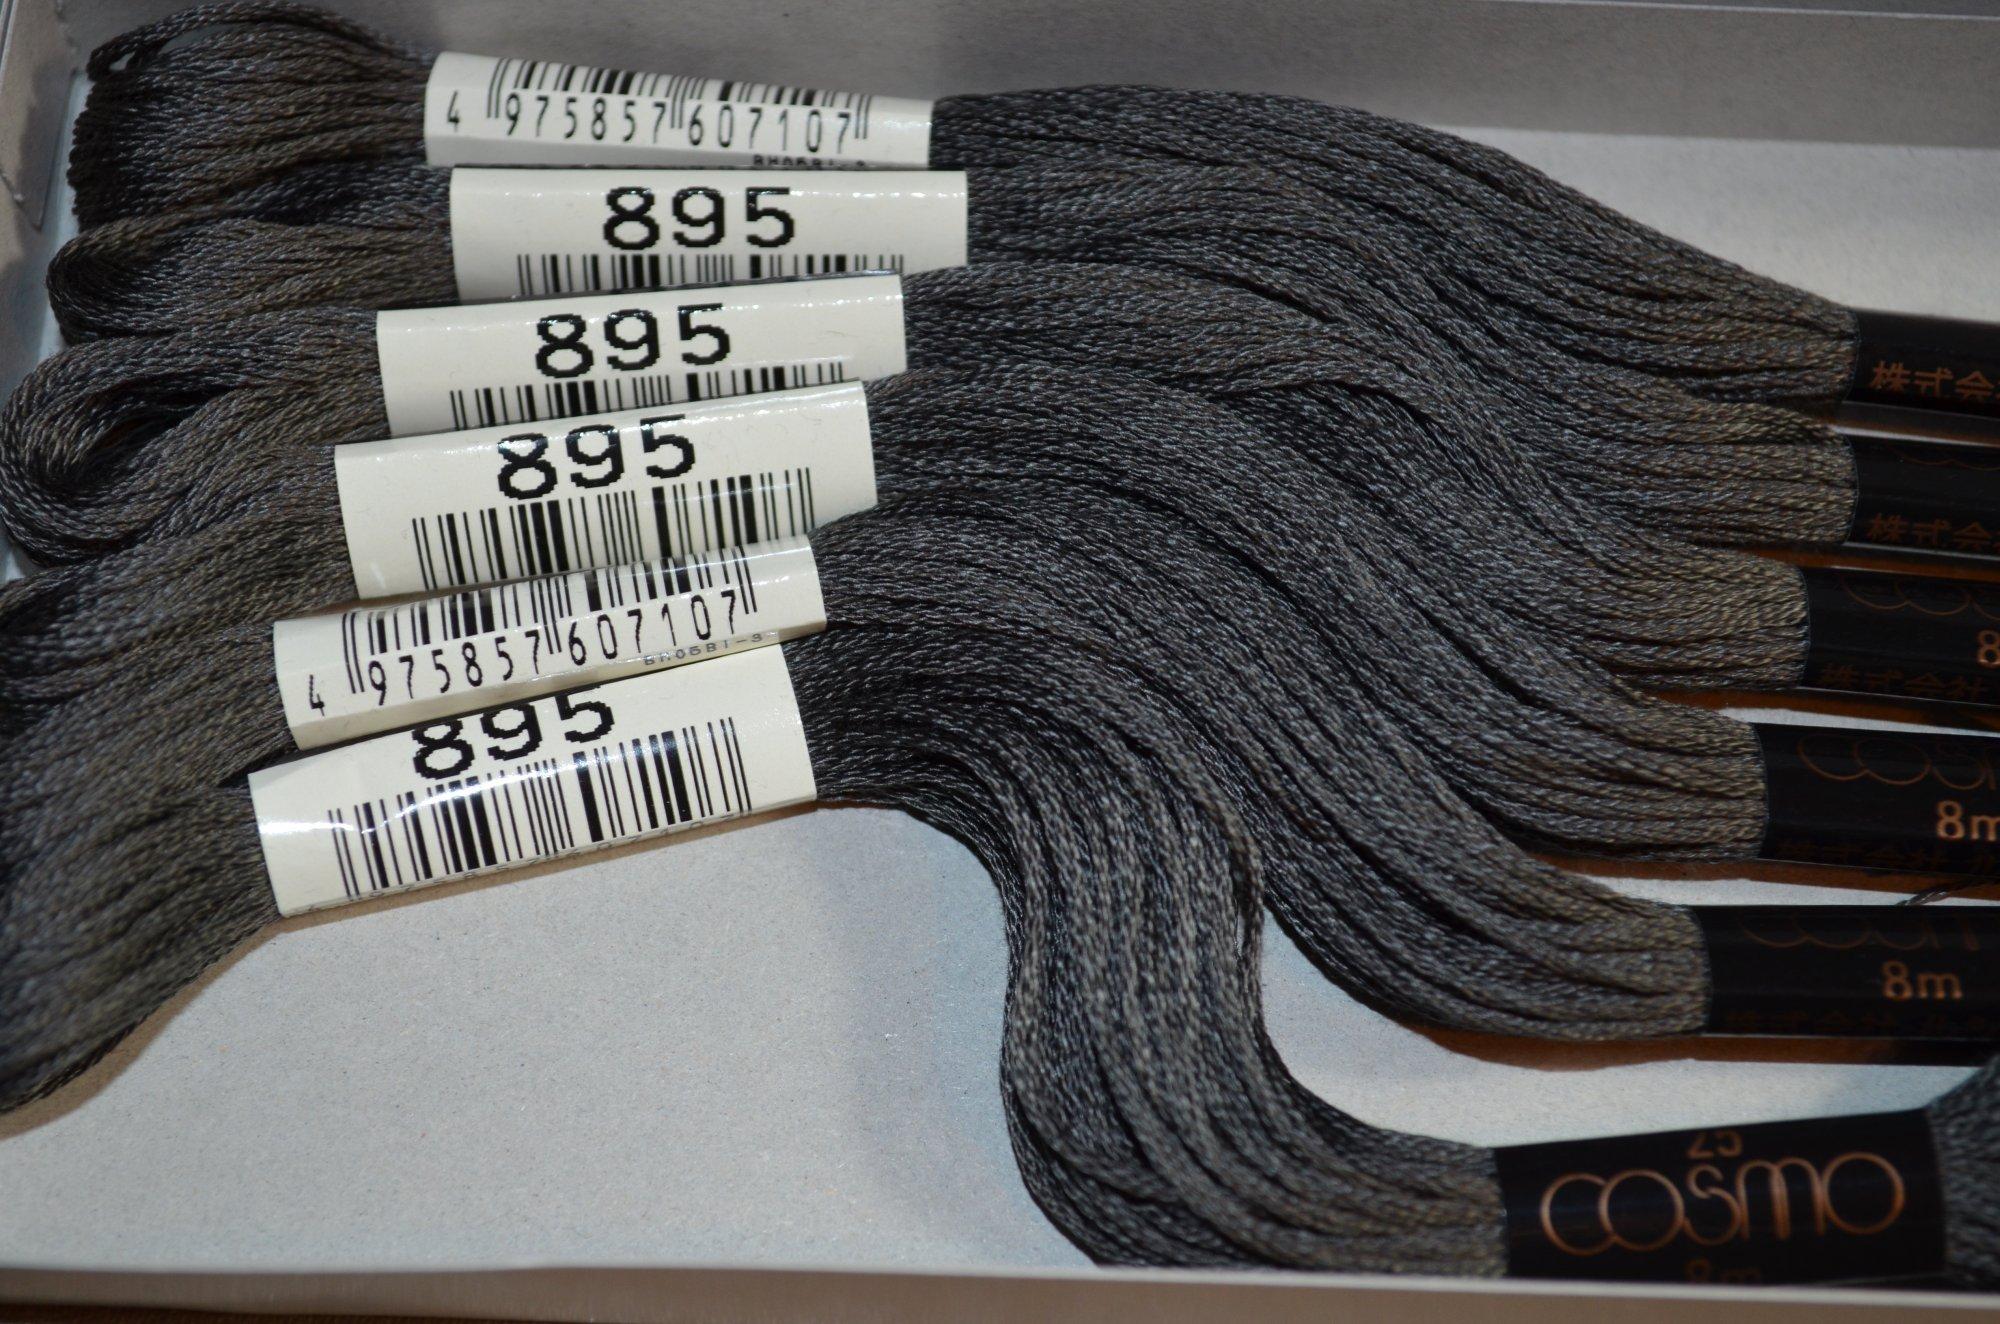 Cosmo Embroidery Floss 8.75Y  LEN2512-895  color 895